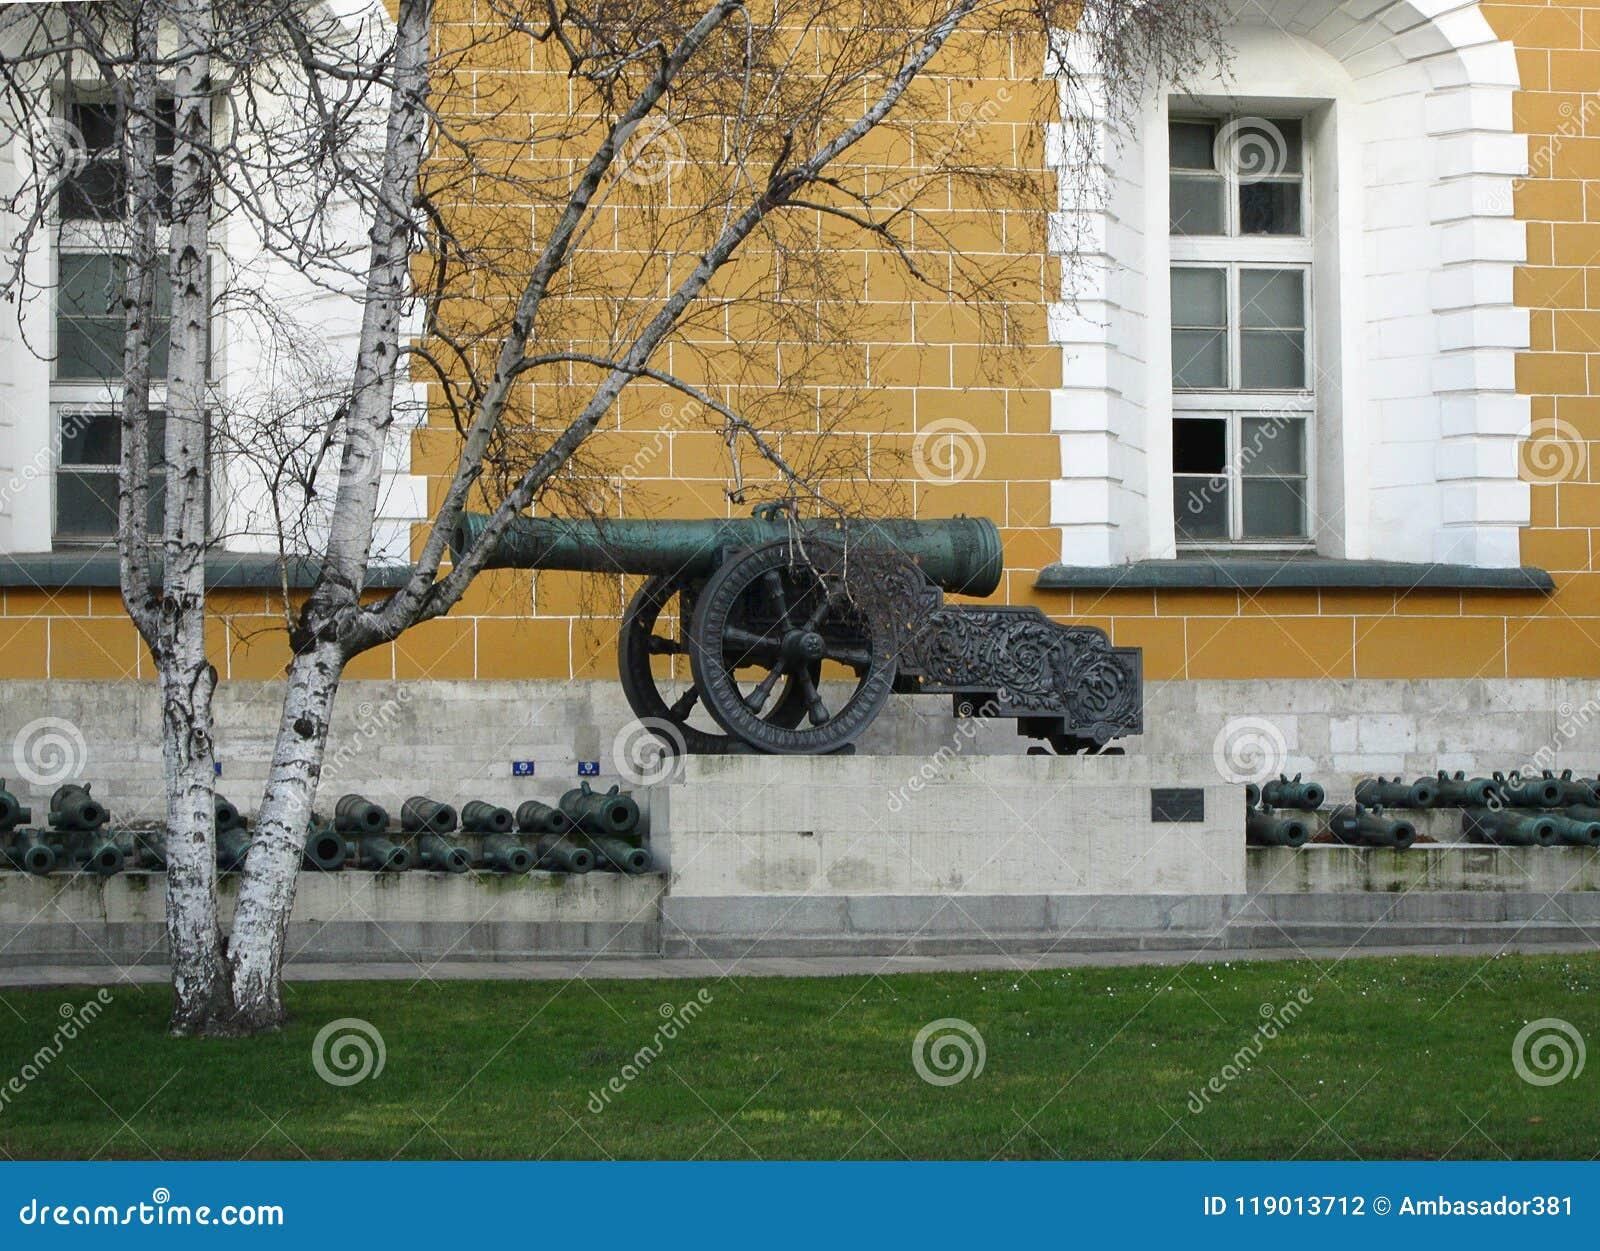 Canons binnen het Kremlin in Rood Vierkant, Moskou Rusland